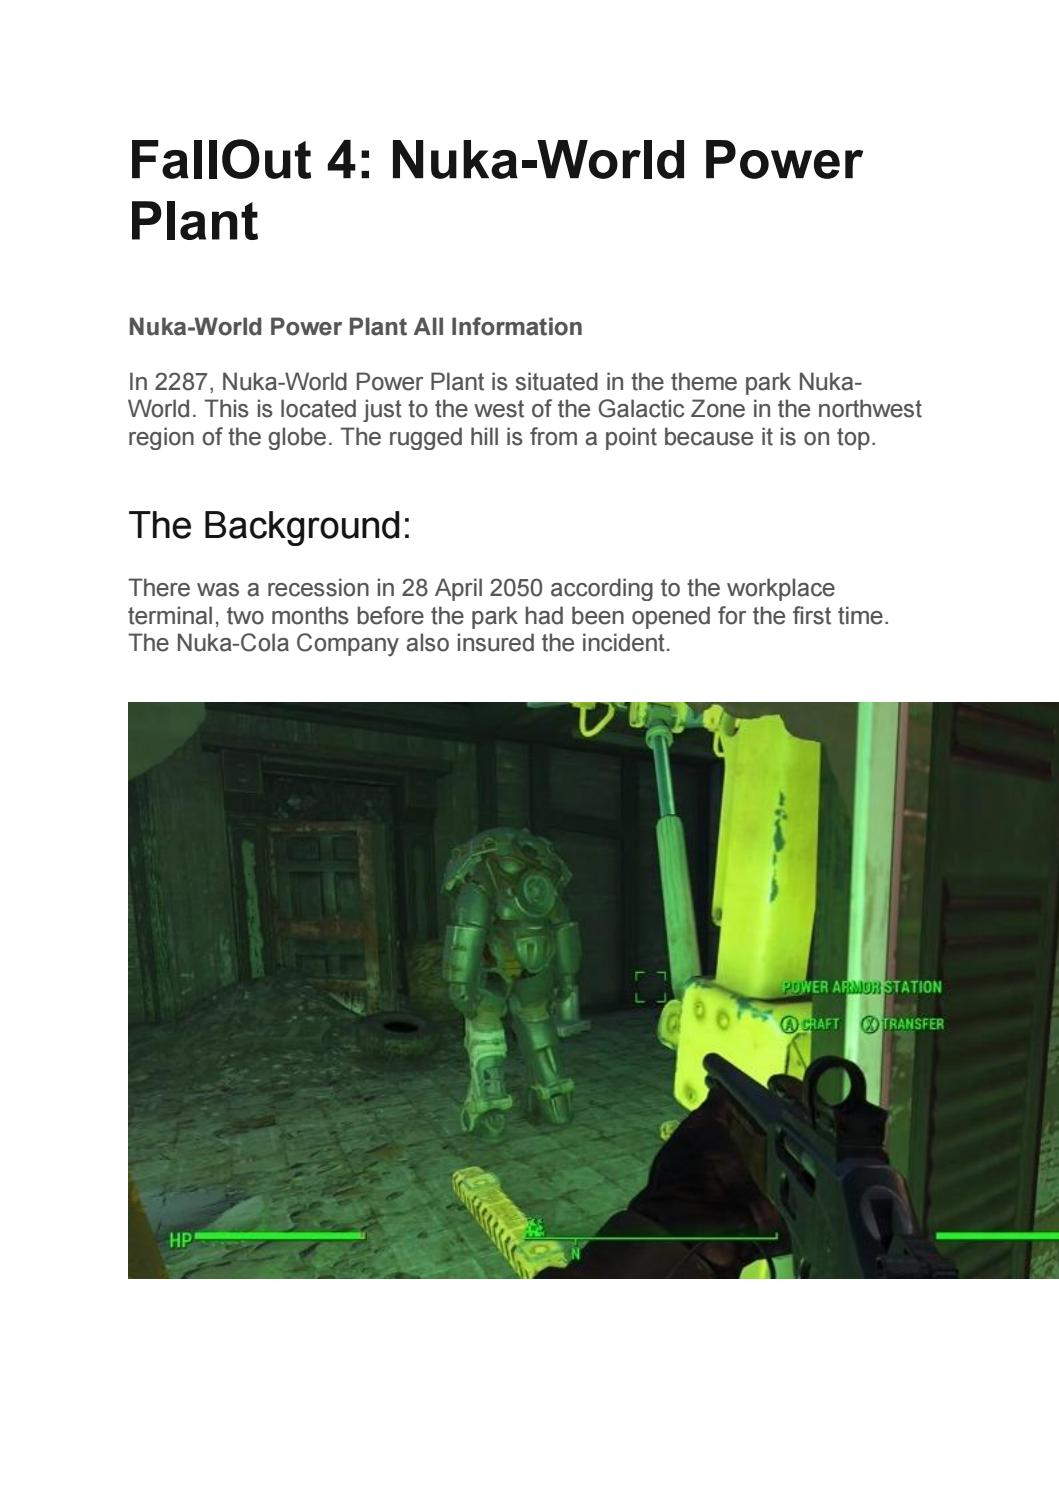 Nuka World Location Fallout 4 : world, location, fallout, FallOut, Nuka-World, Power, Plant, Thoughtscloud, Issuu